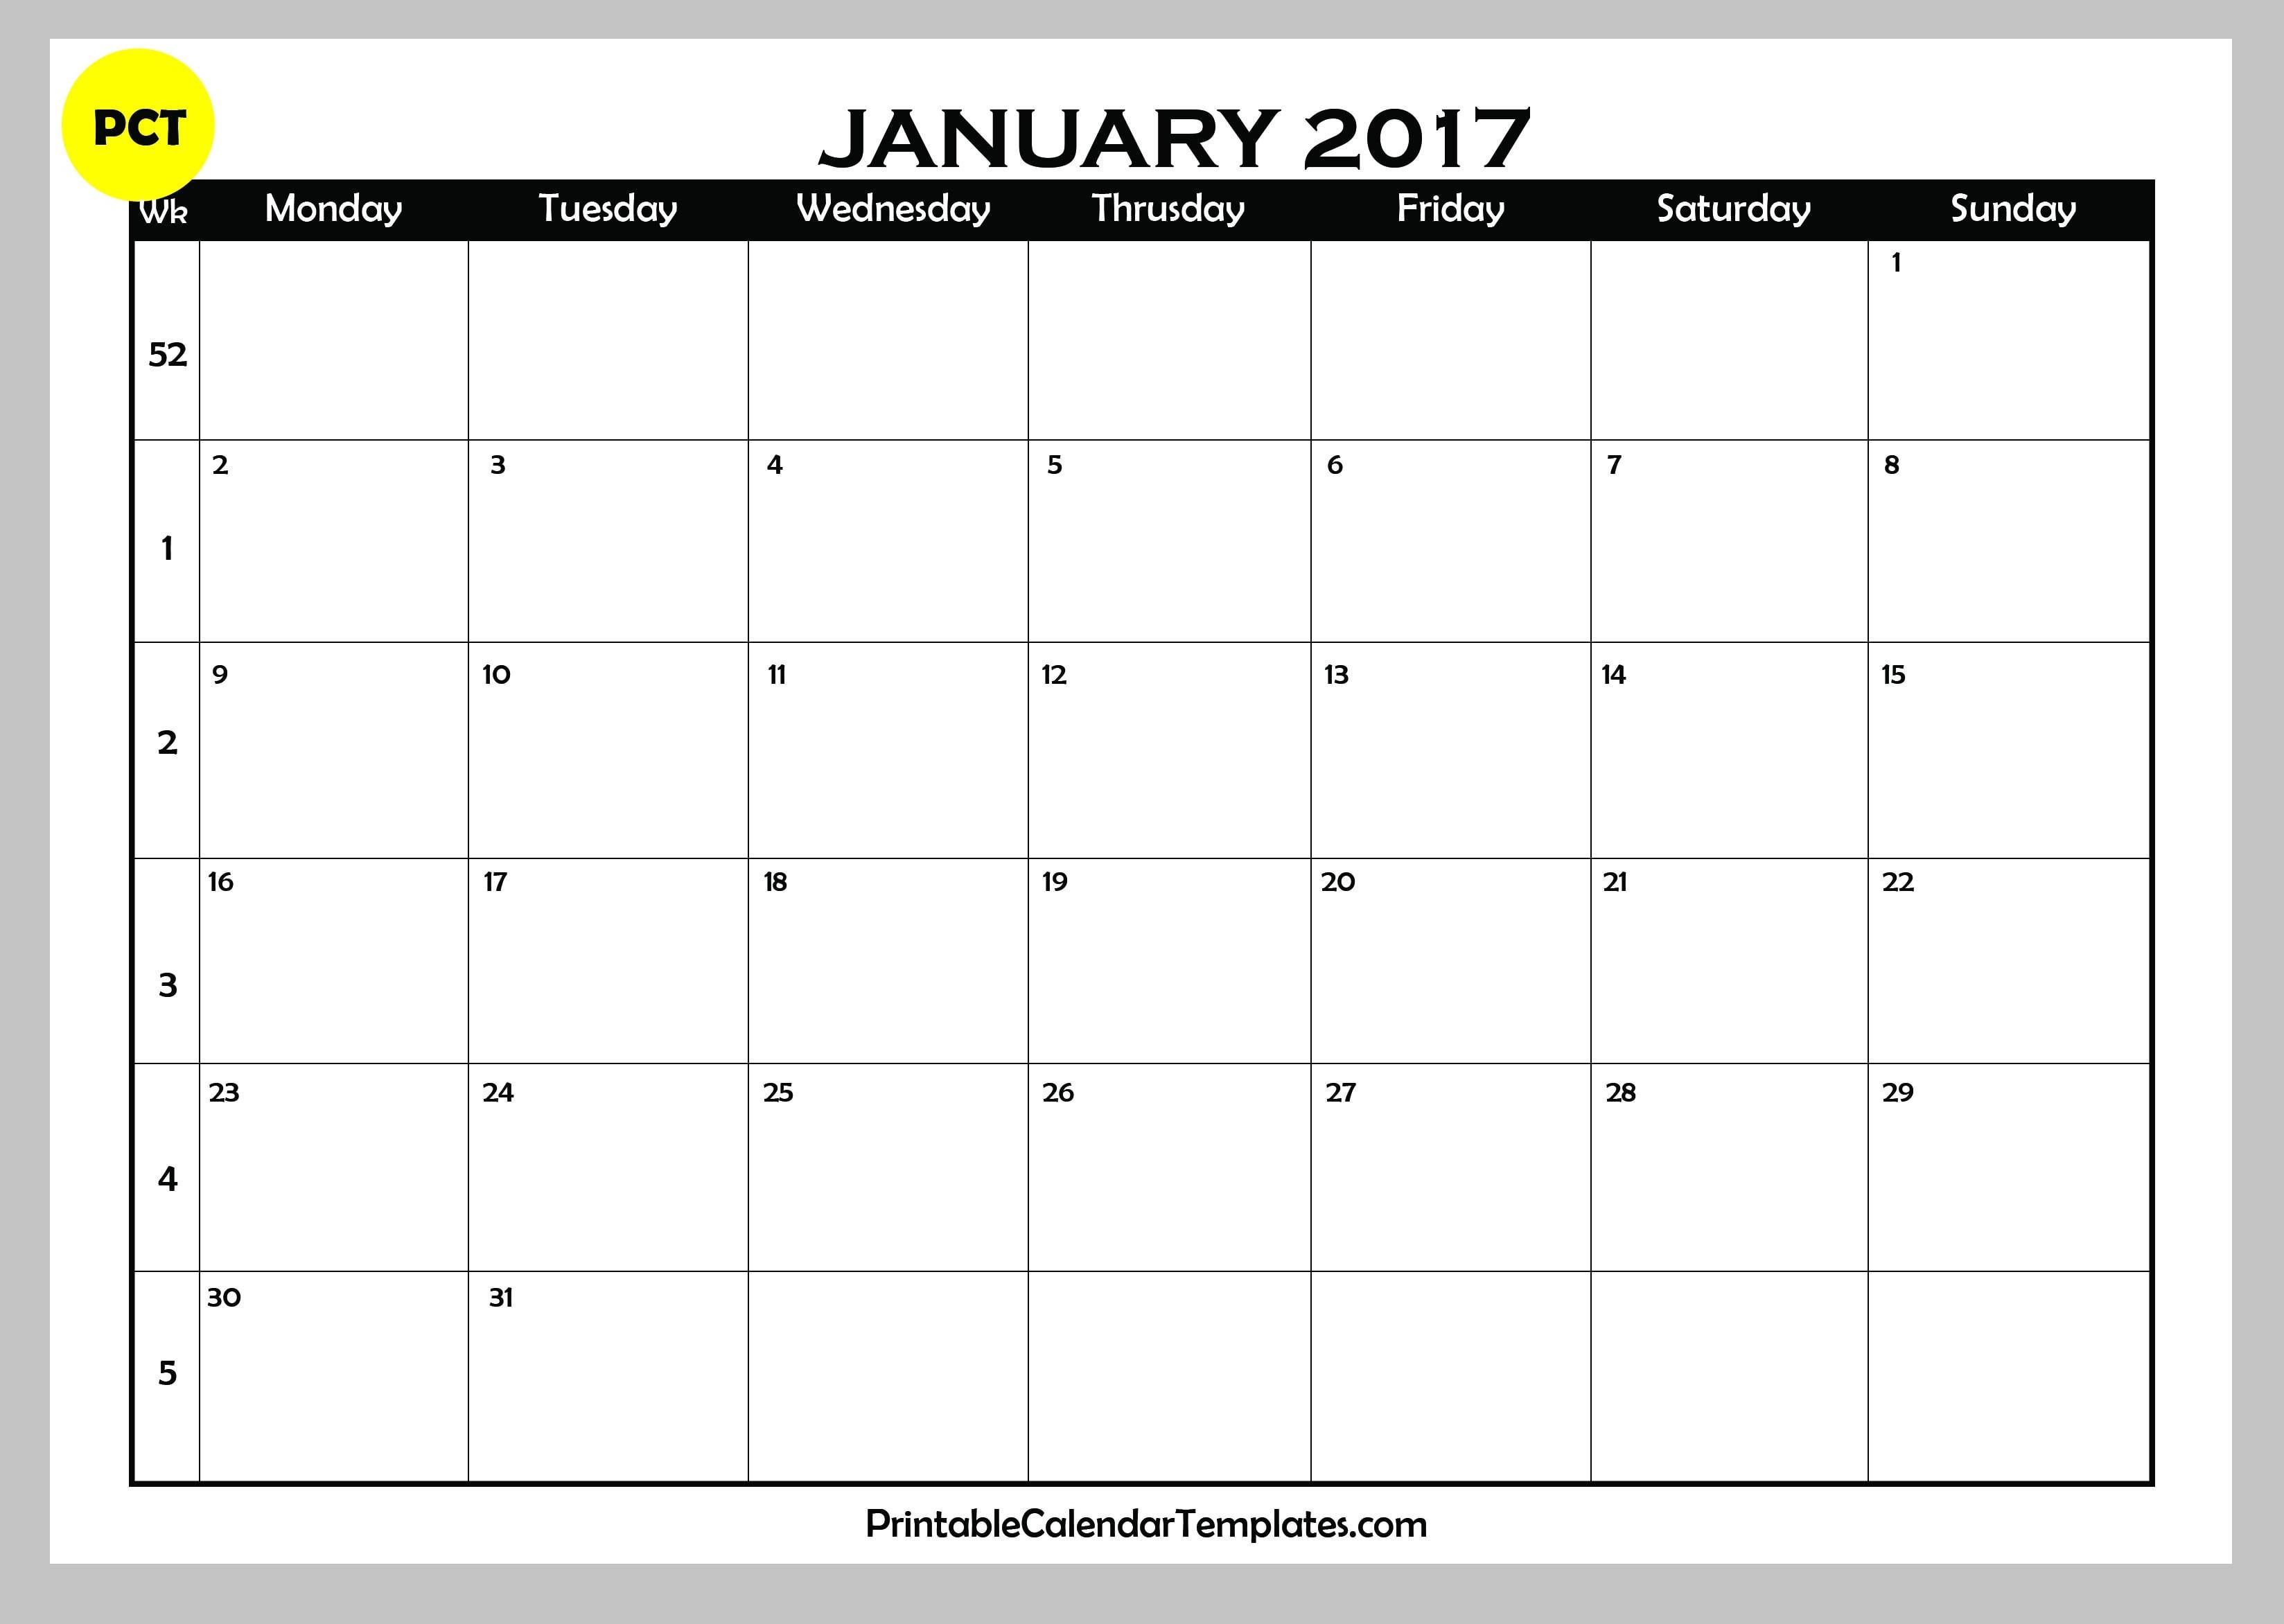 ... .com/wp-content/uploads/2016/10/jan-2017-blank-calendar-bw-Copy.jpg